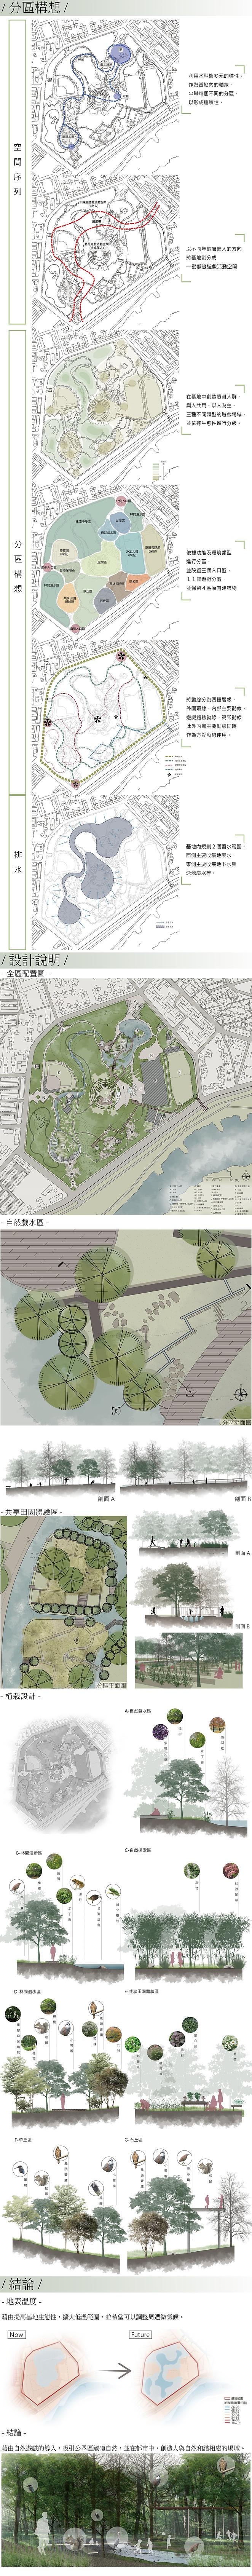 Naturescape in City-作品內容2.jpg